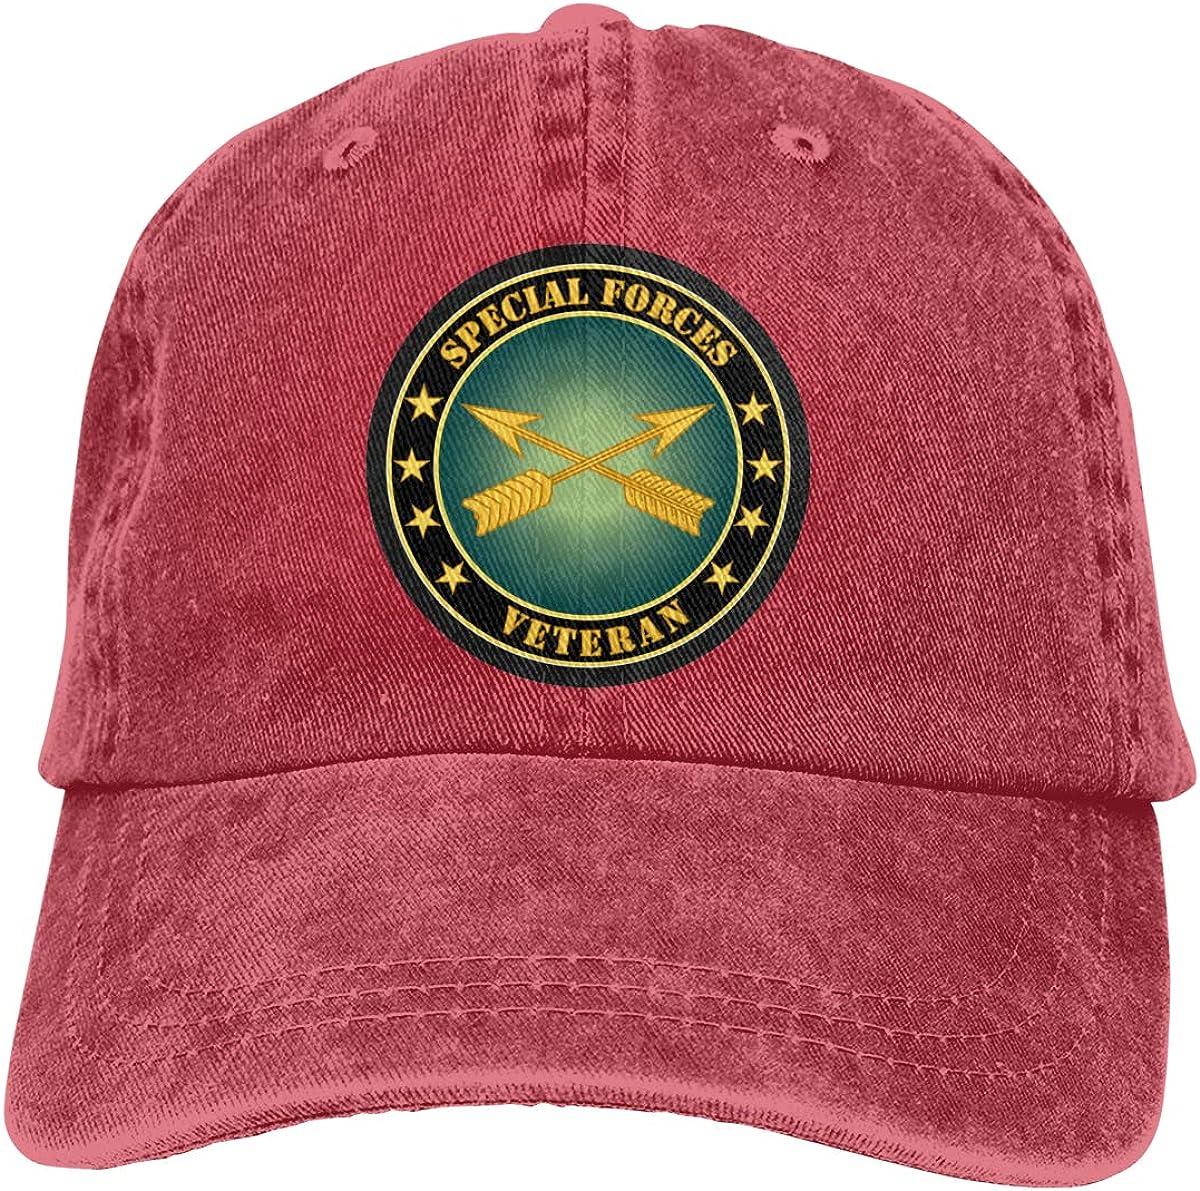 Men Women Classic Yarn-Dyed Denim Baseball Cap Special Forces Veteran Snapback Cap